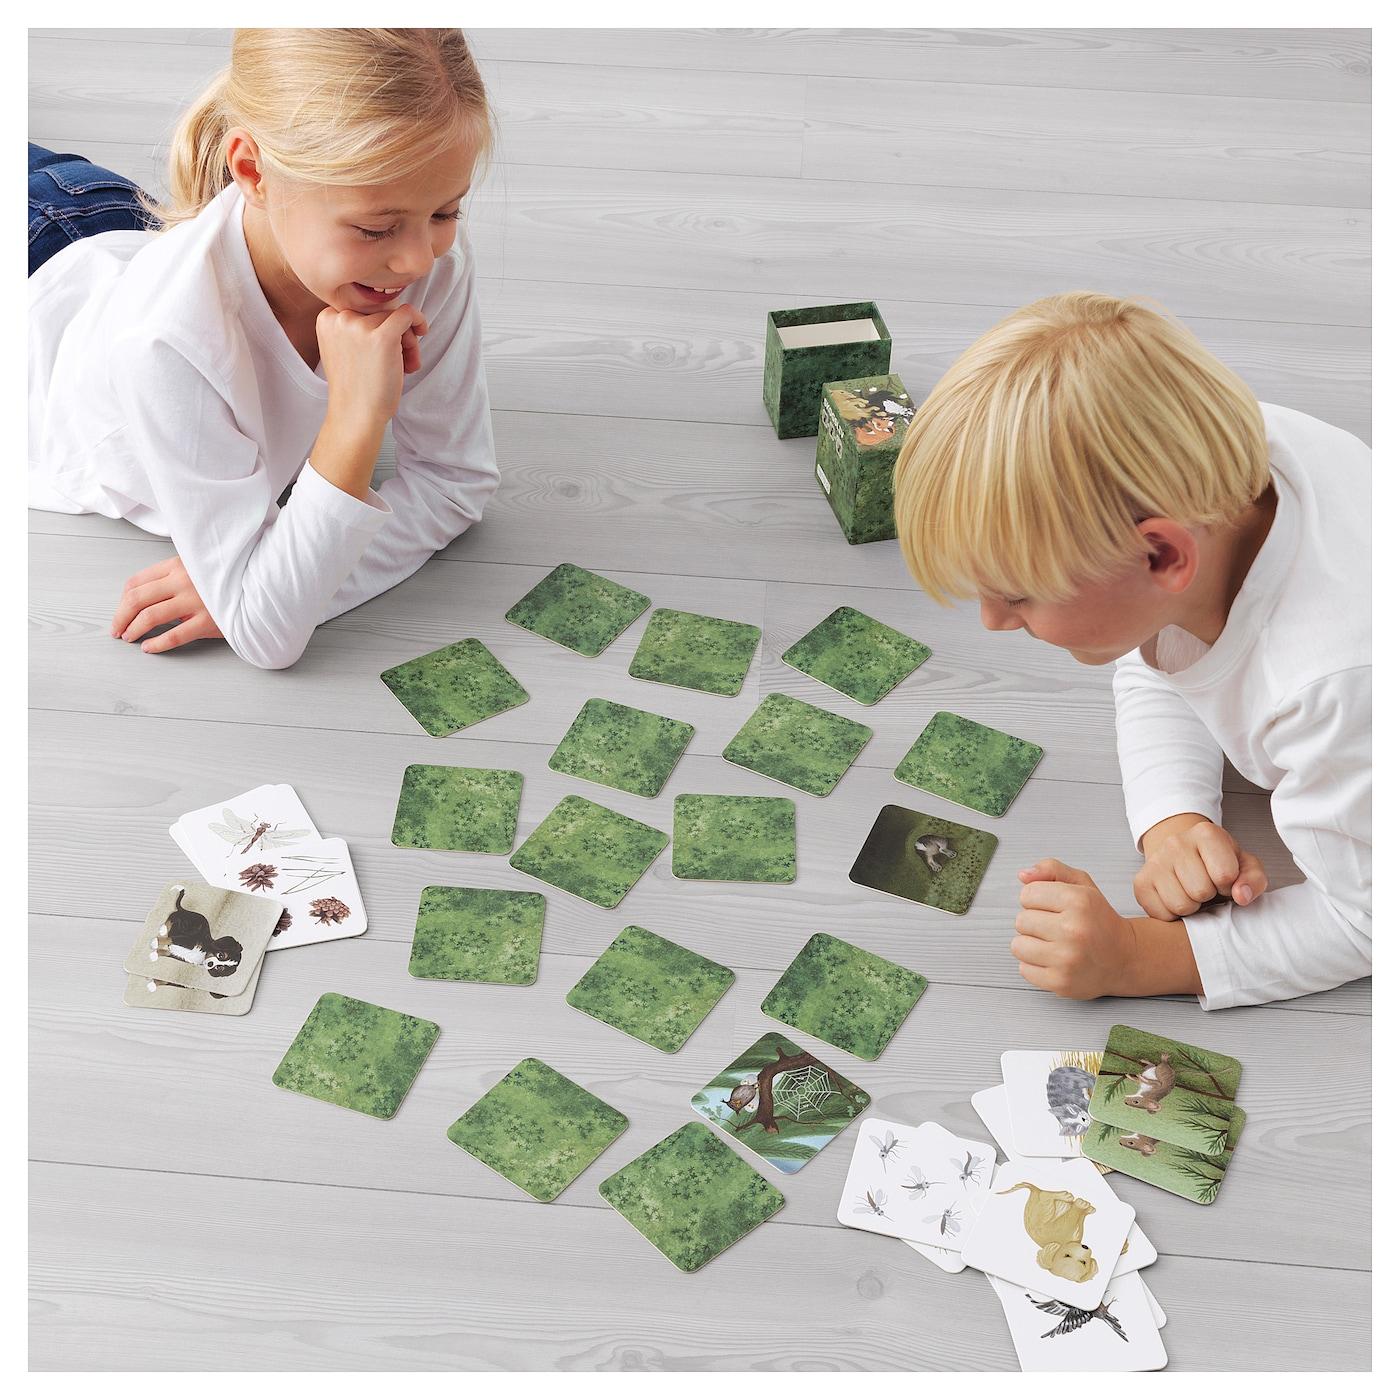 skogsliv jeu de cartes 17 paires ikea. Black Bedroom Furniture Sets. Home Design Ideas